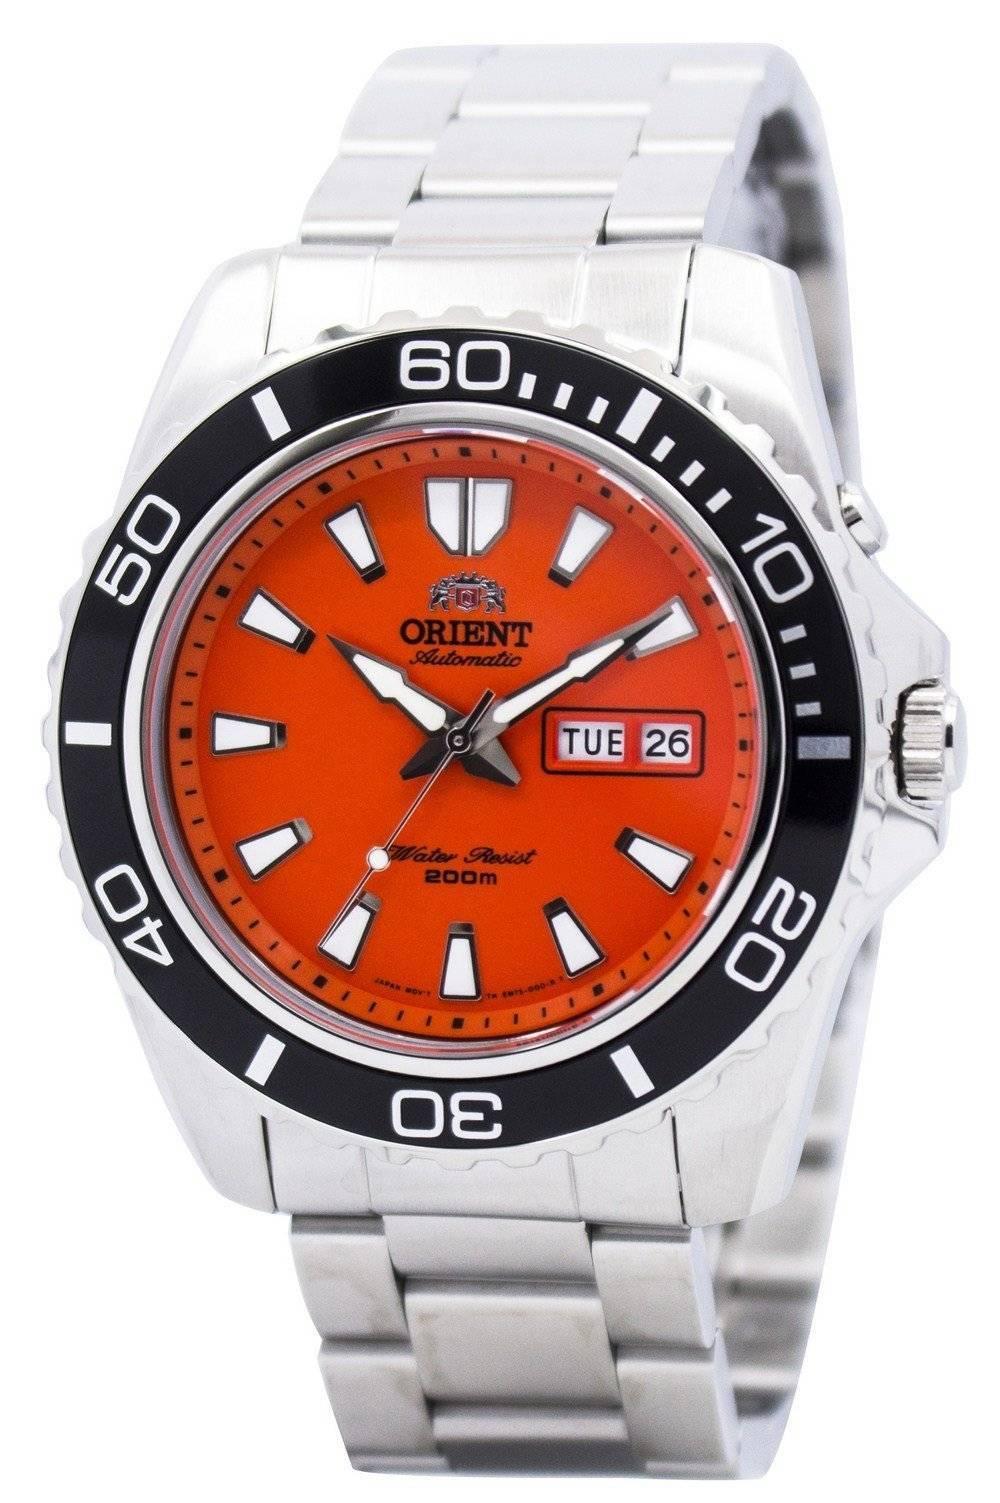 Orient mako automatic diver cem75001m men 39 s orange dial watch ebay - Orange dive watch ...